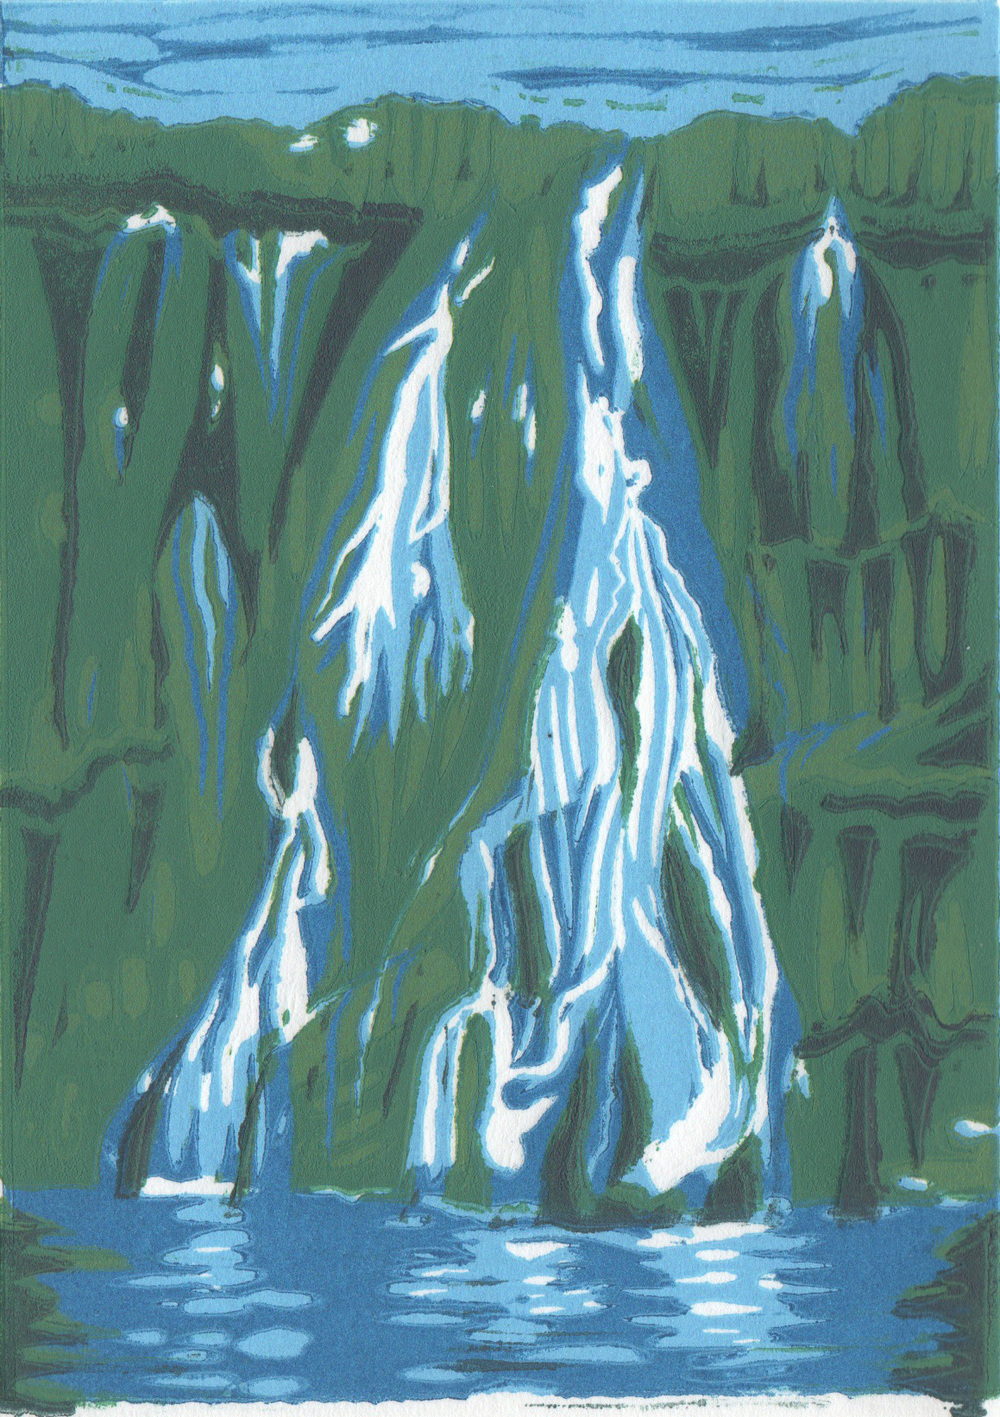 Waterfall, 2011